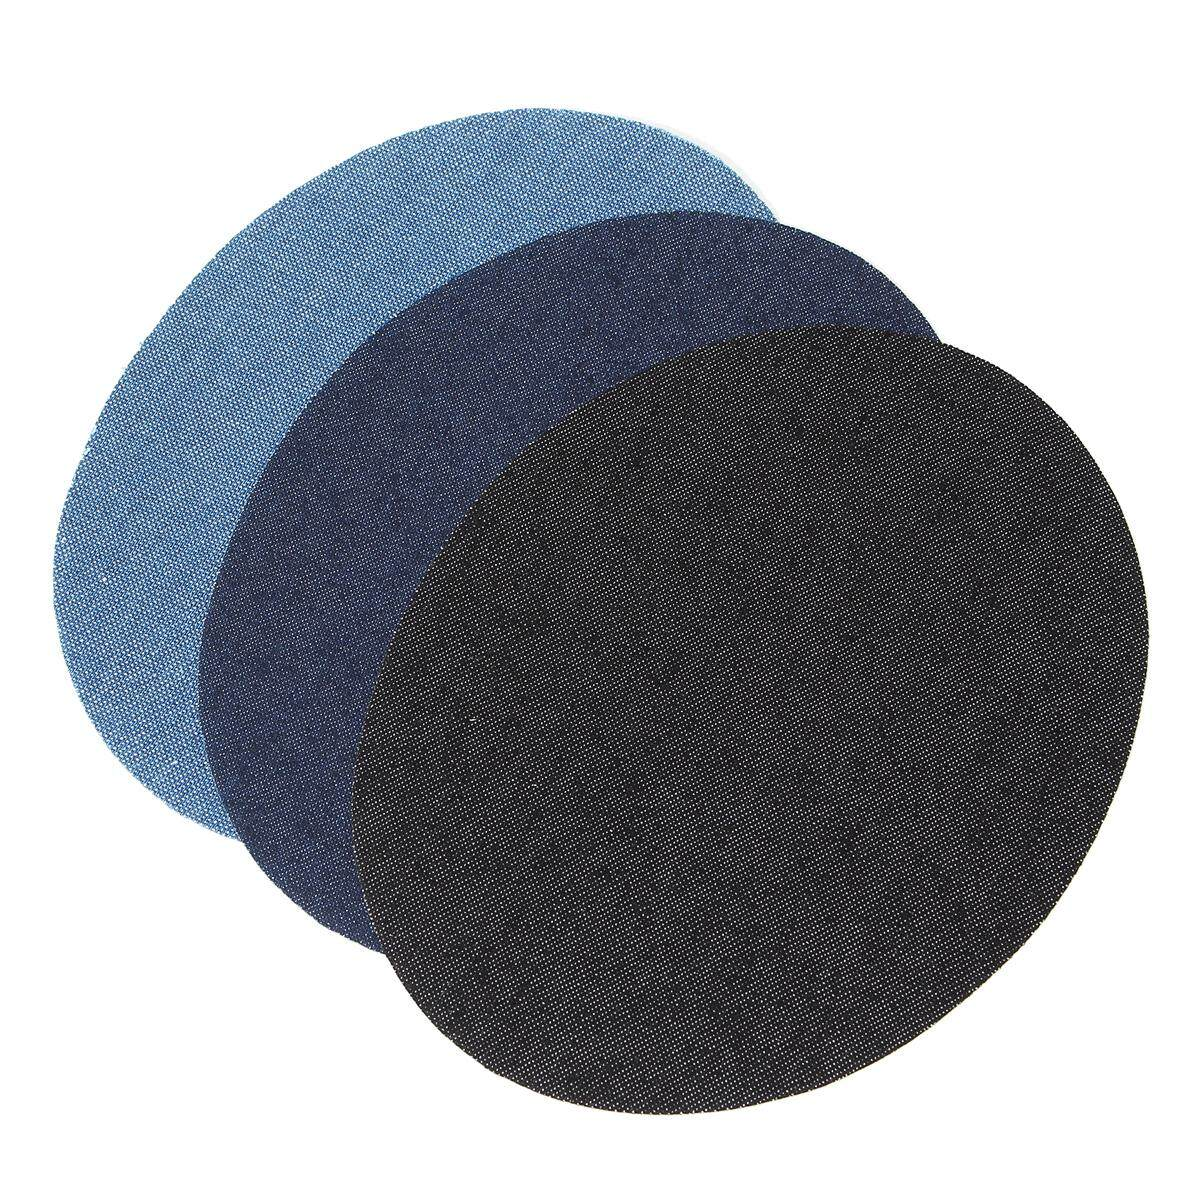 12 Pcs Aneka Besi Di Jeans Denim/Kain Kepar/Katun Patches Perbaikan Siku Lutut Stiker Jahit Bordiran DIY- internasional